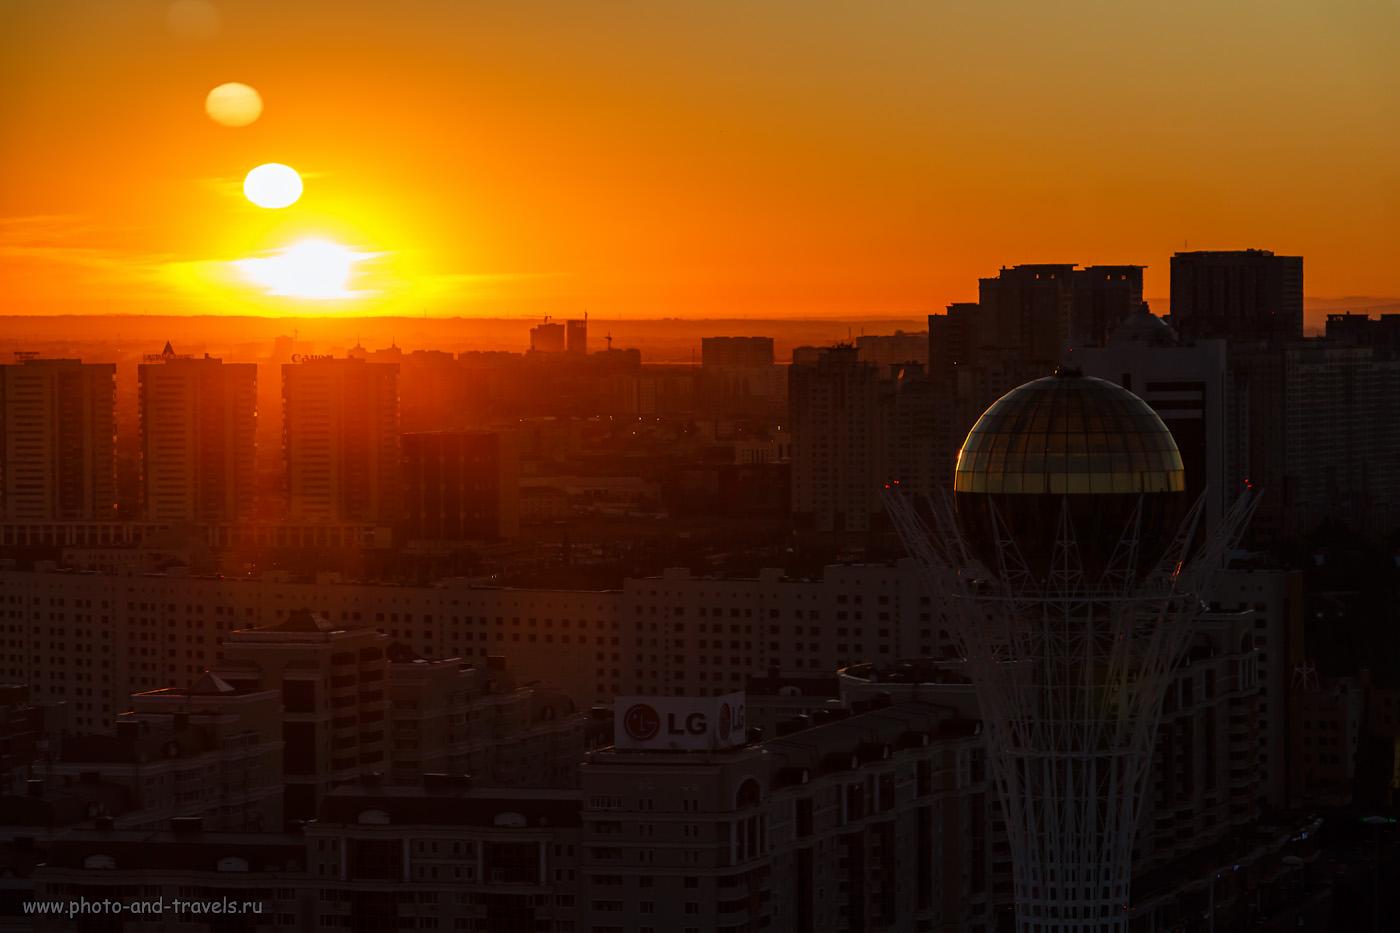 Снимок 39. Два солнца: на горизонте и на «Байтереке». Прекрасное утро в Астане. 1/200, +0.3, 8, 200, 97.